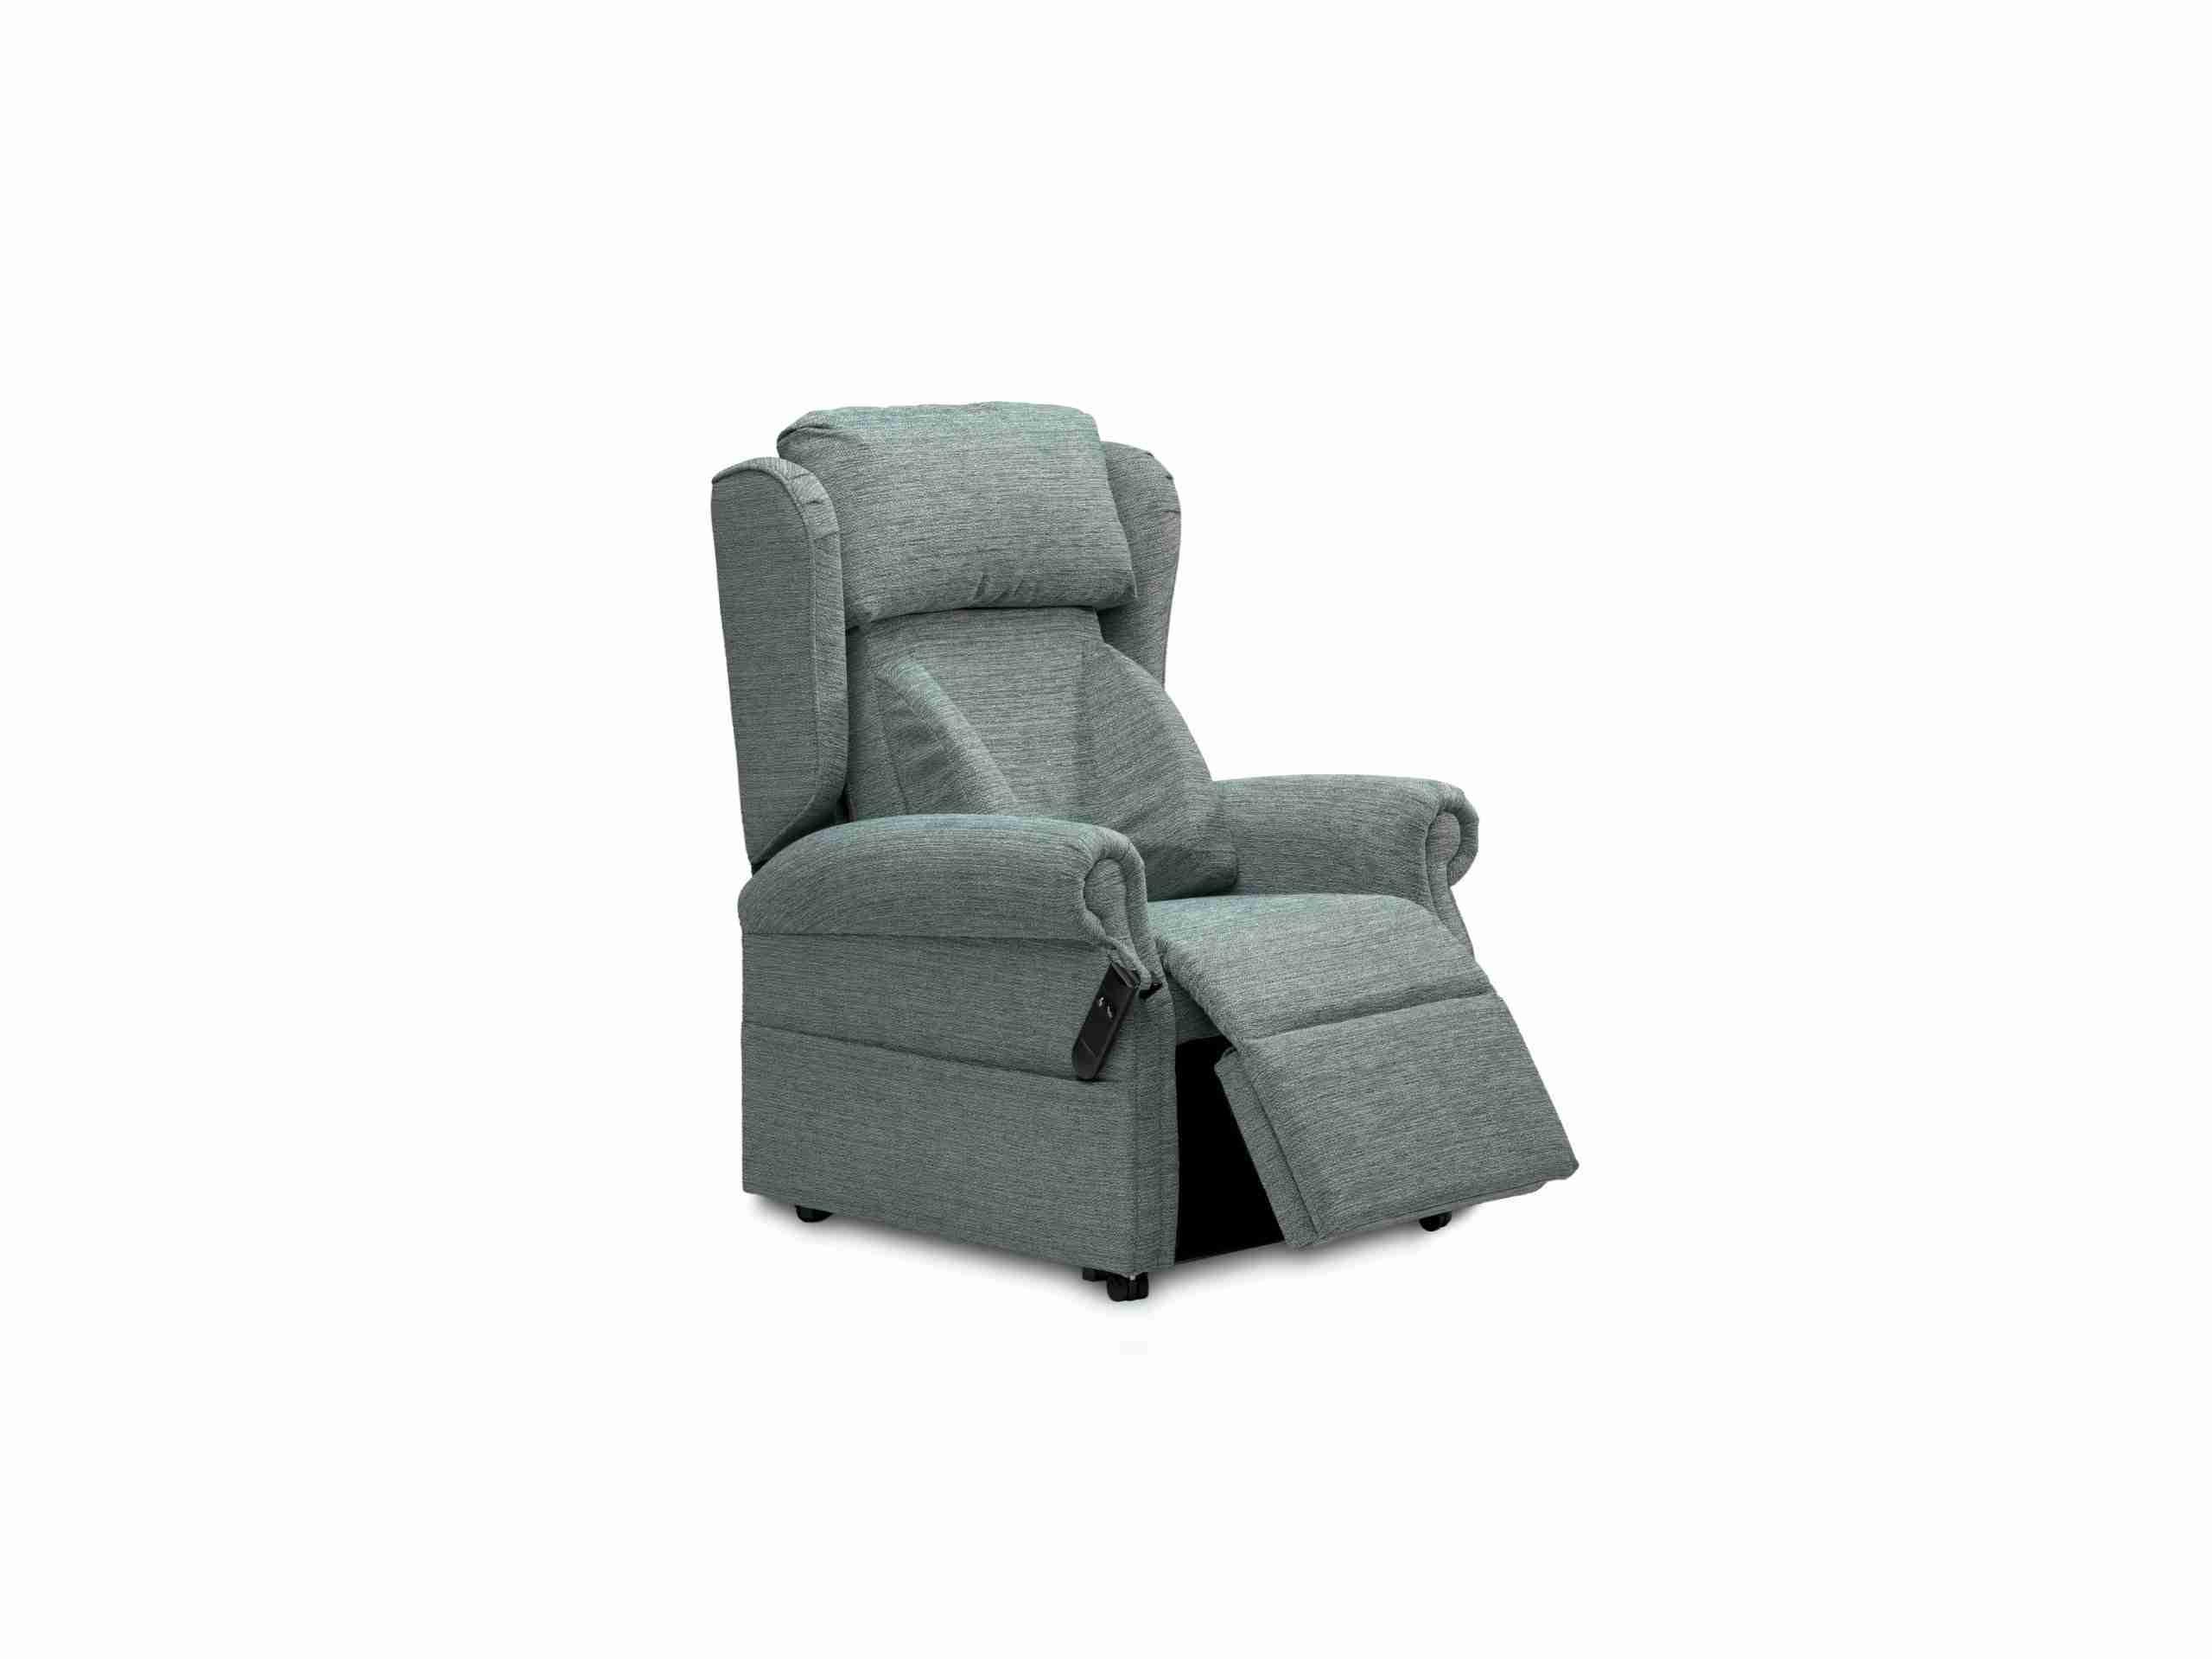 Chatsworth Chair Repose003